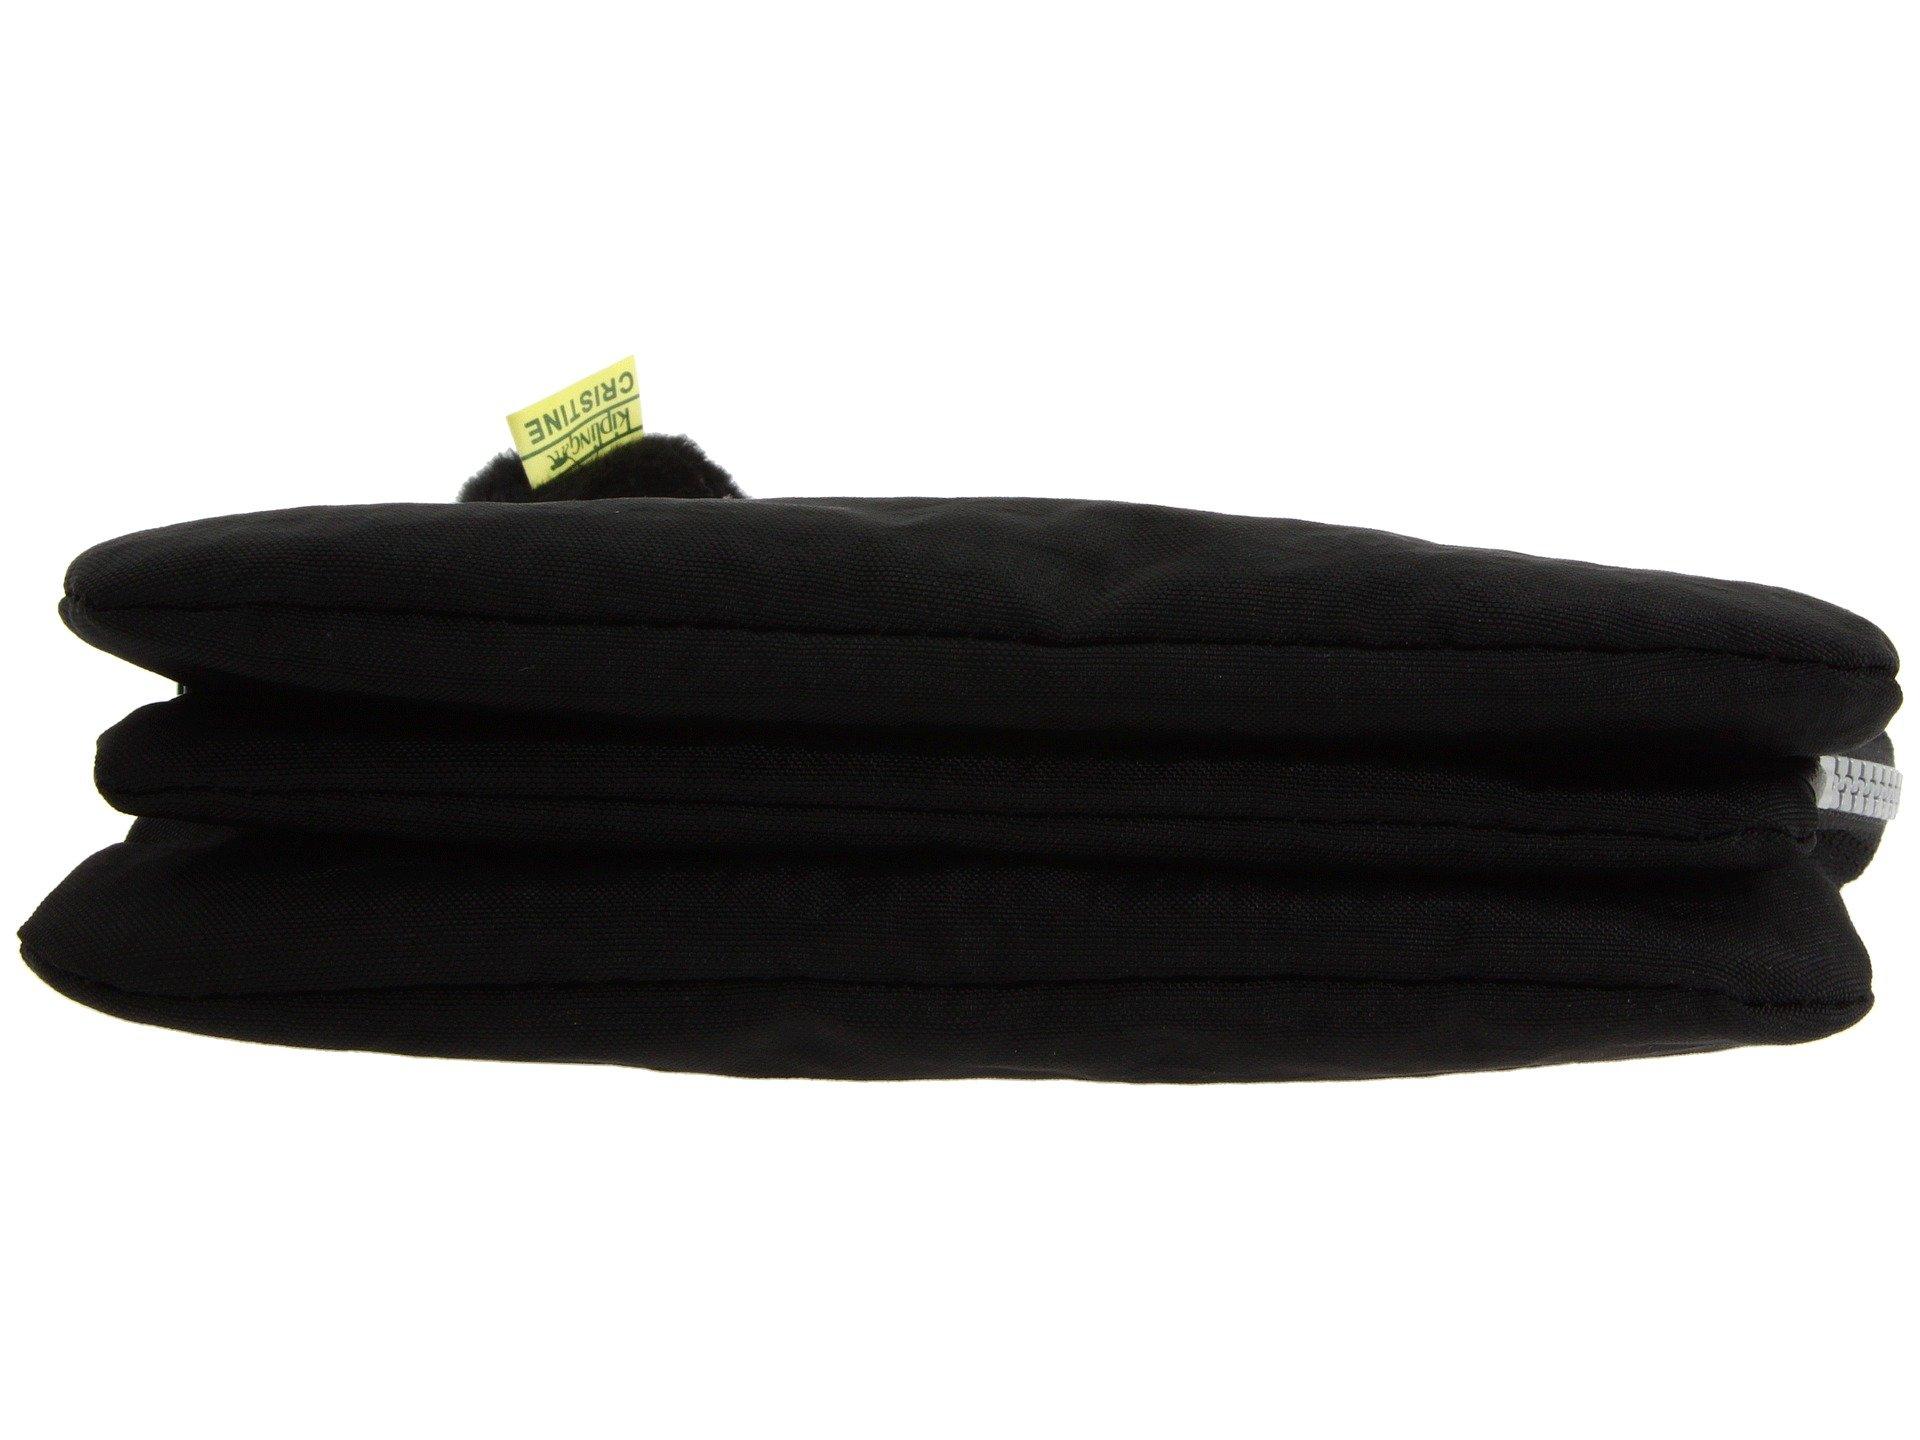 Creativity Black Large Pouch Large Creativity Large Kipling Kipling Black Creativity Kipling Pouch wfgqYAH